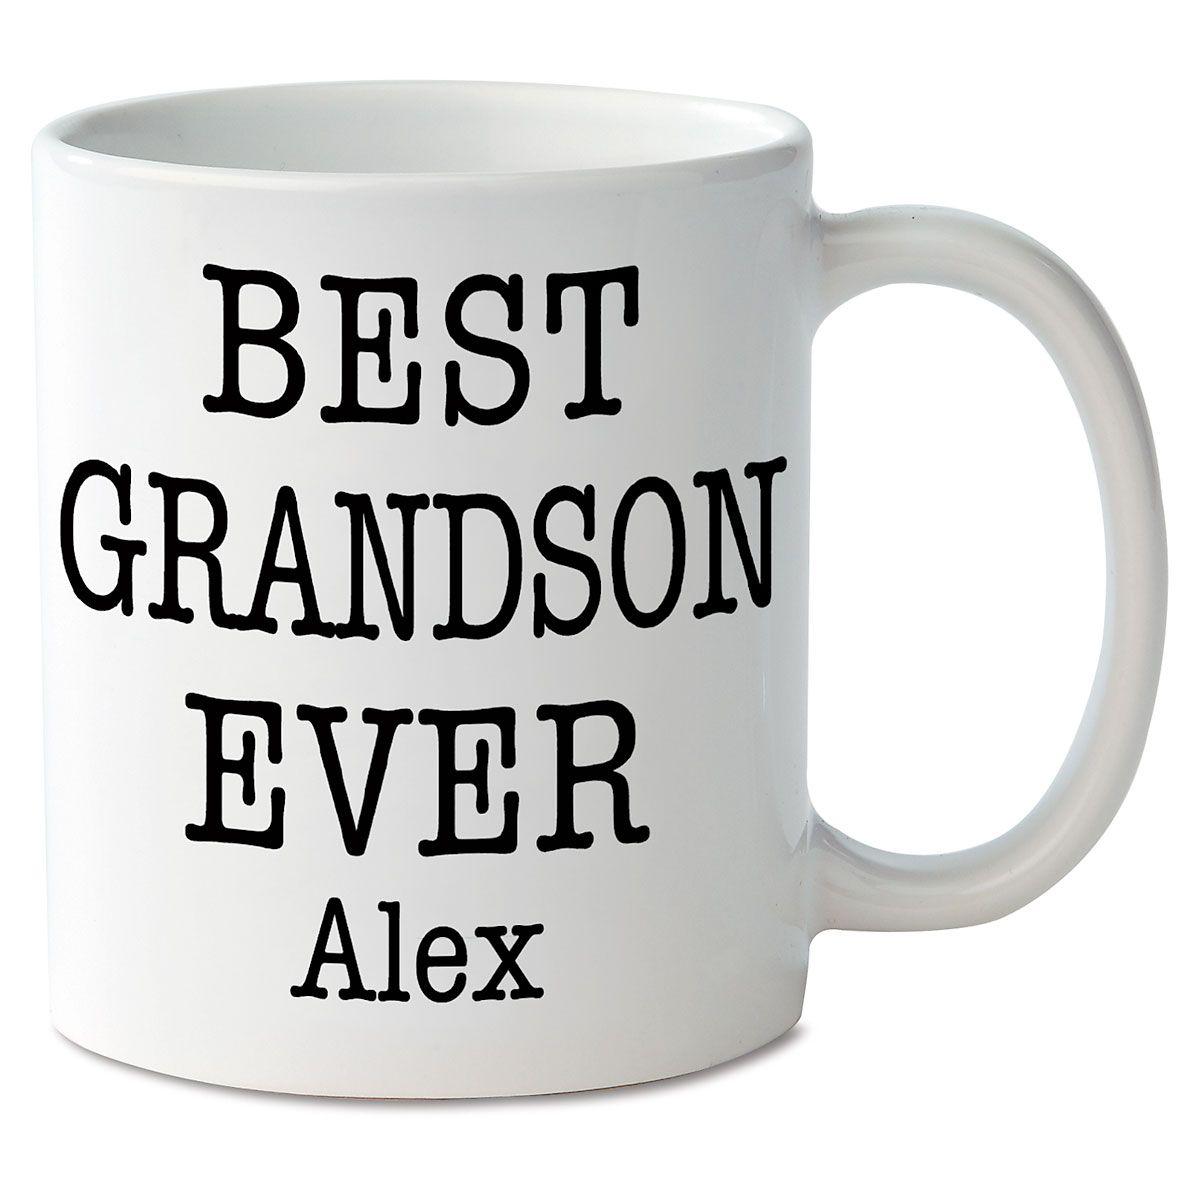 Best Grandson Ever Personalized Mug